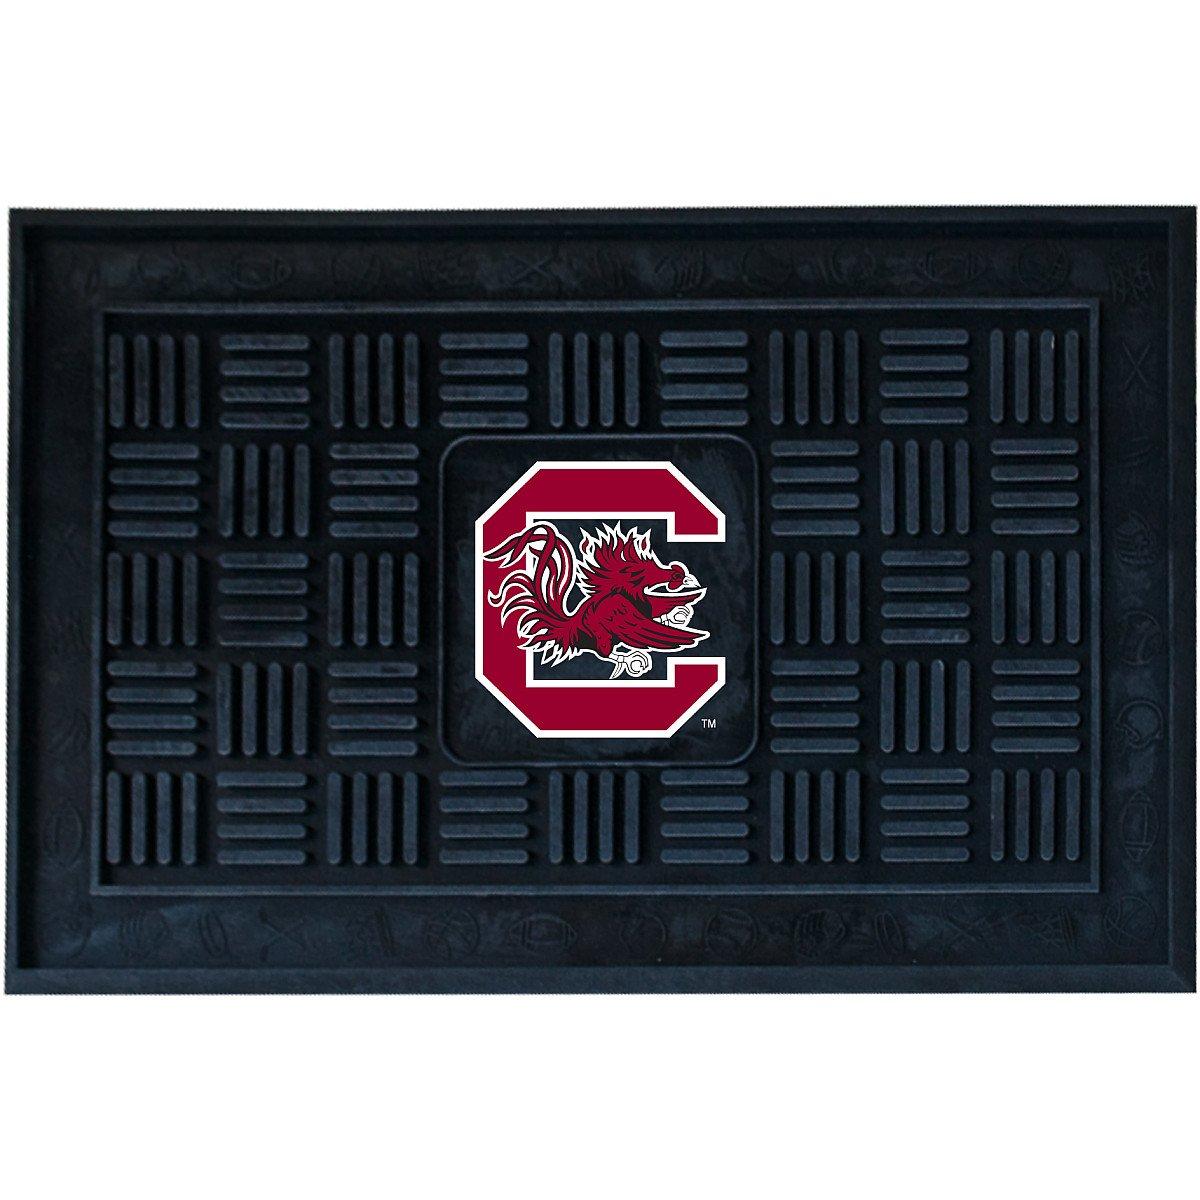 large 3 Fan Mats University of South Carolina Get a Grip//small 1.5